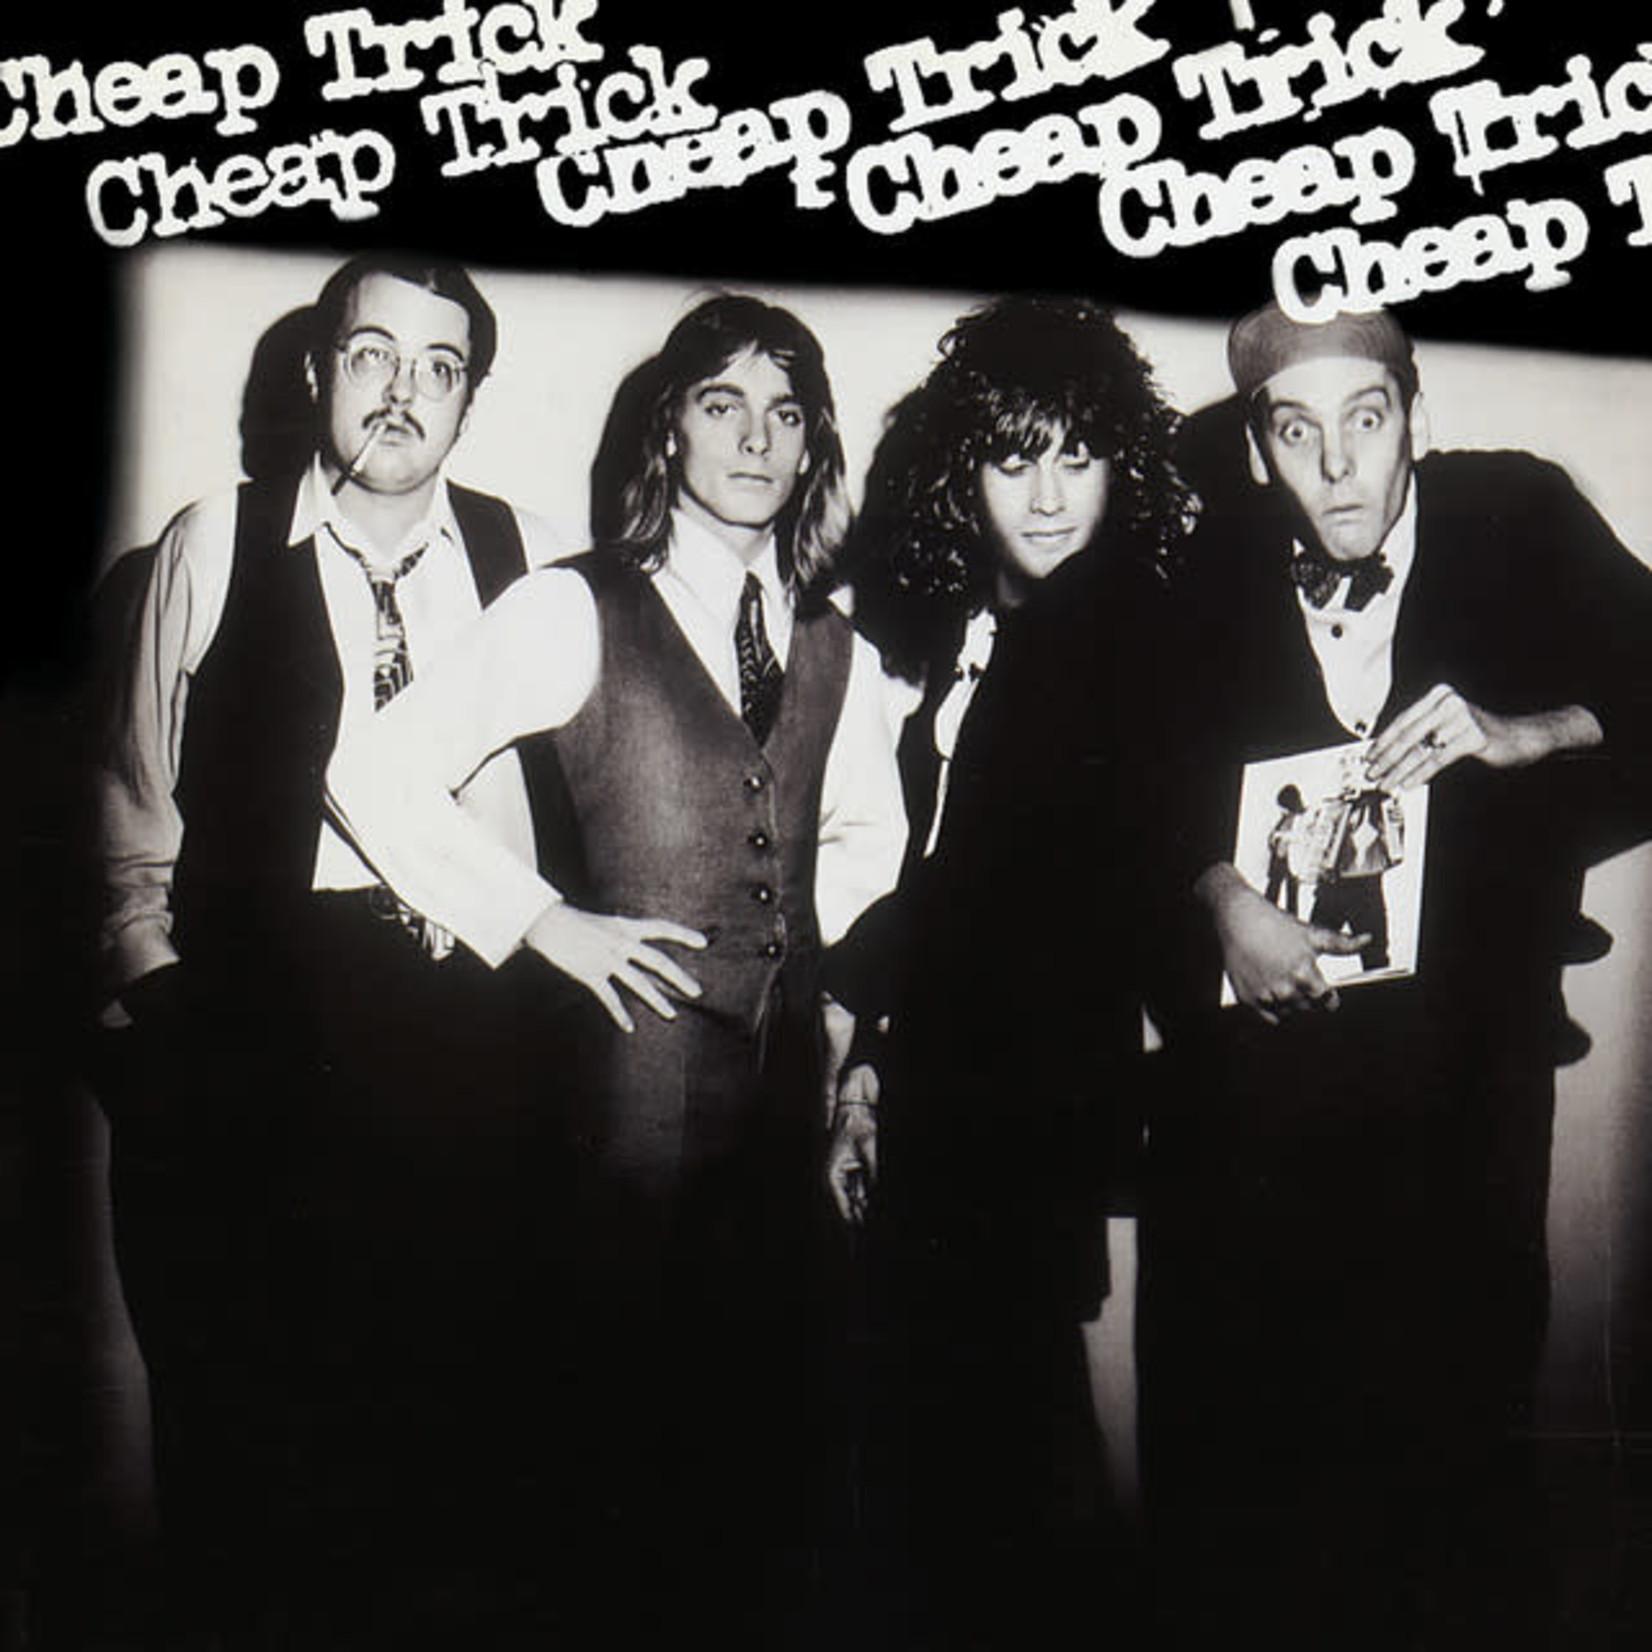 Vinyl Cheap Trick - S/T